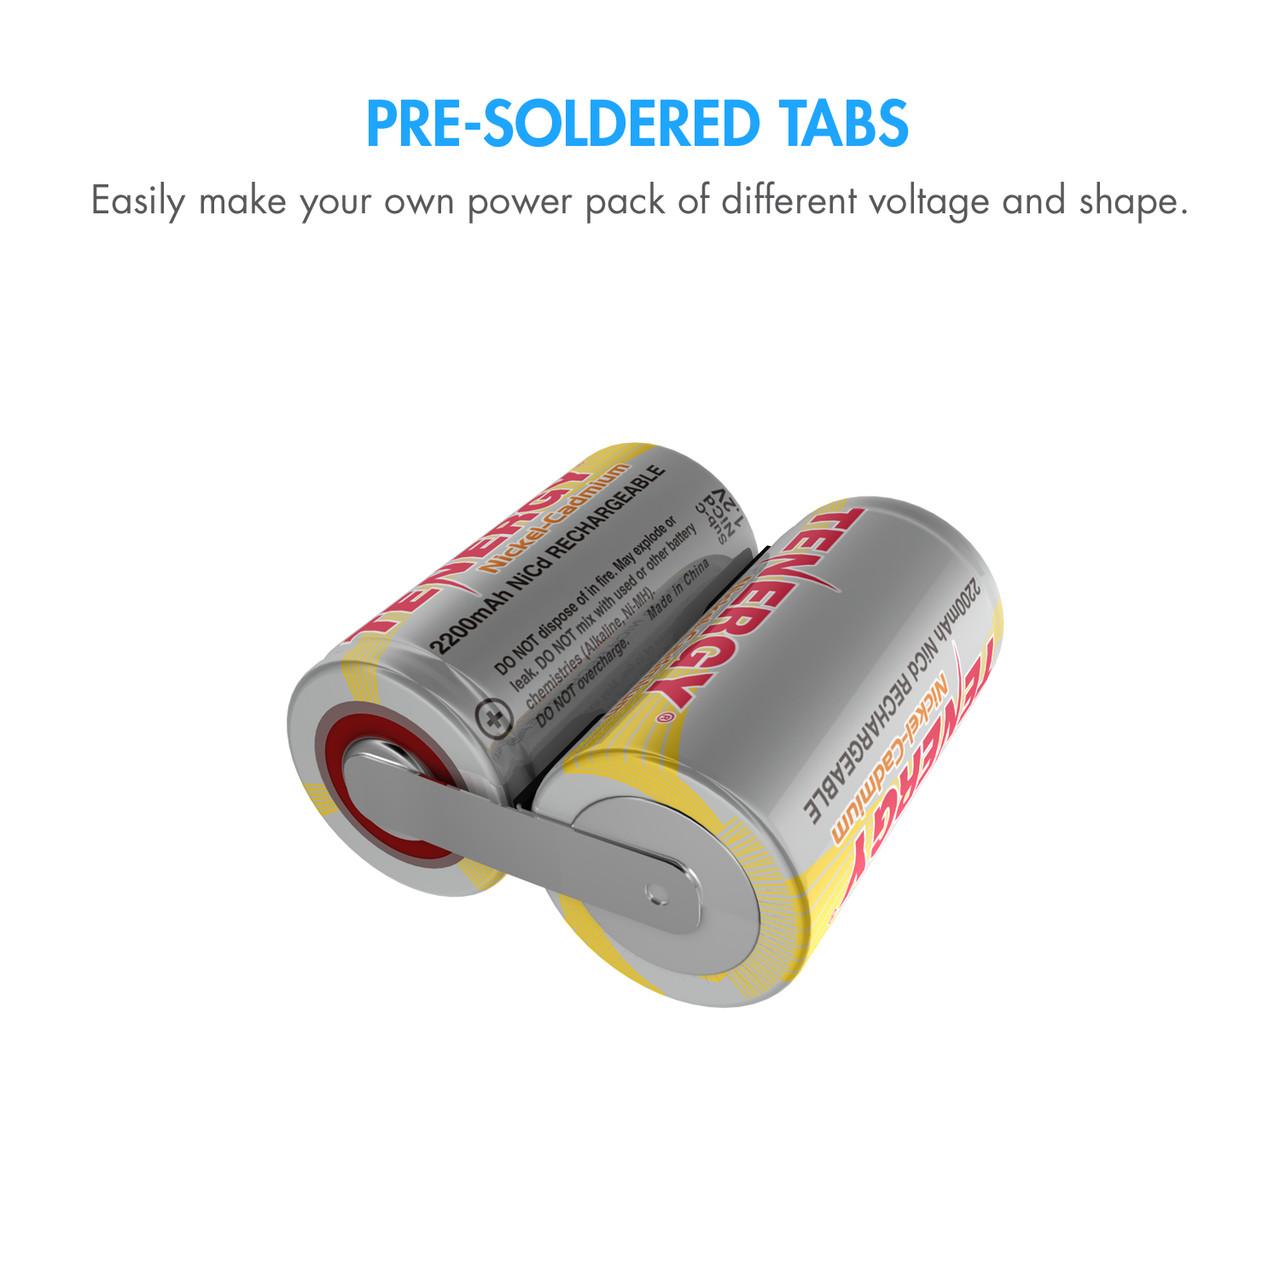 COMBO: 120 pcs of NiCd Sub C 2200mAh Batteries for Power Tools Flat Top No Tabs